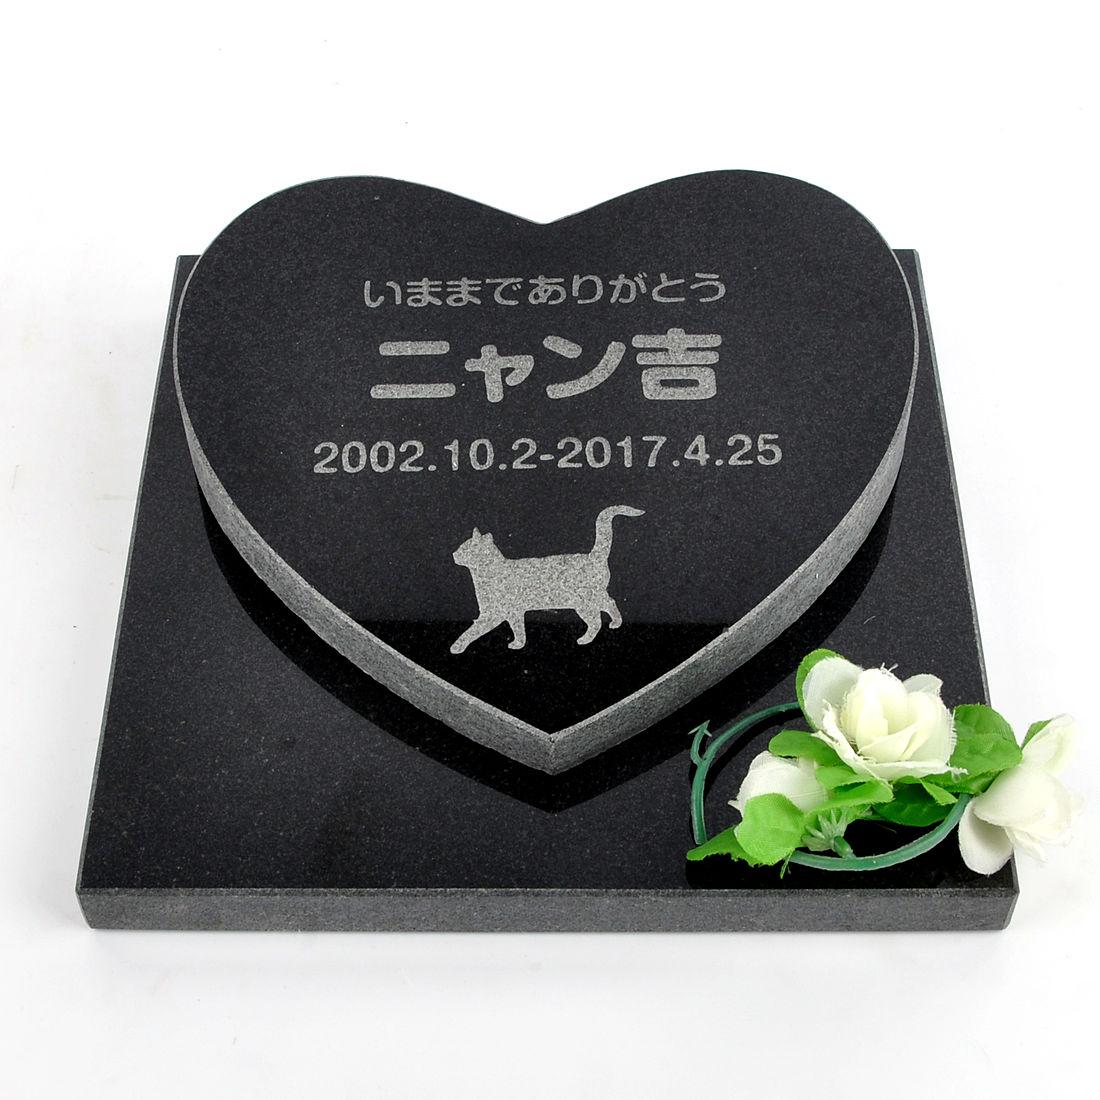 Pet&Love. ペットのお墓 天然石製 セット型 御影石 ブラック ハート プレーン  【HLS_DU】【楽ギフ_名入れ】 attr131attr ctgr2ctgr sml3sml+ctgr2ctgr CAT